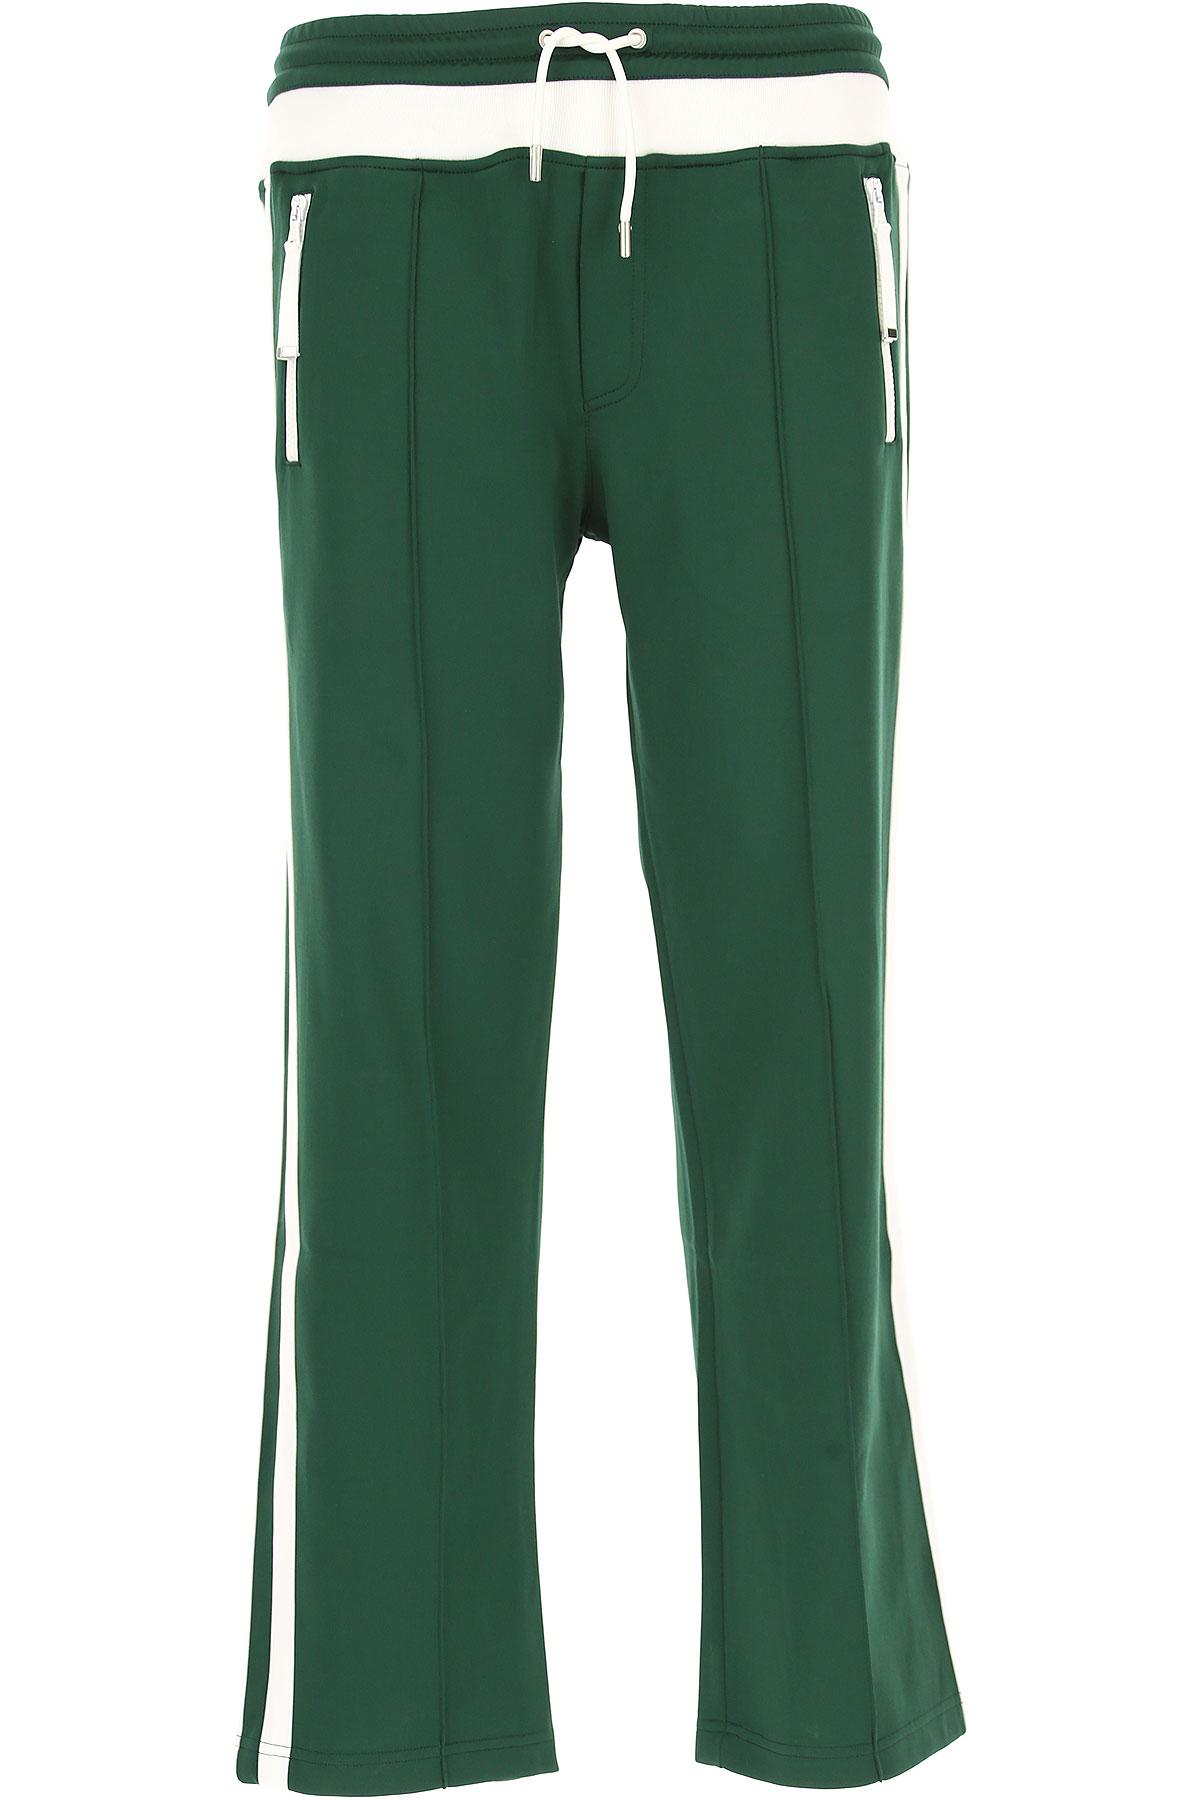 Image of Diesel Sweatpants, Green, Nylon, 2017, 30 32 34 36